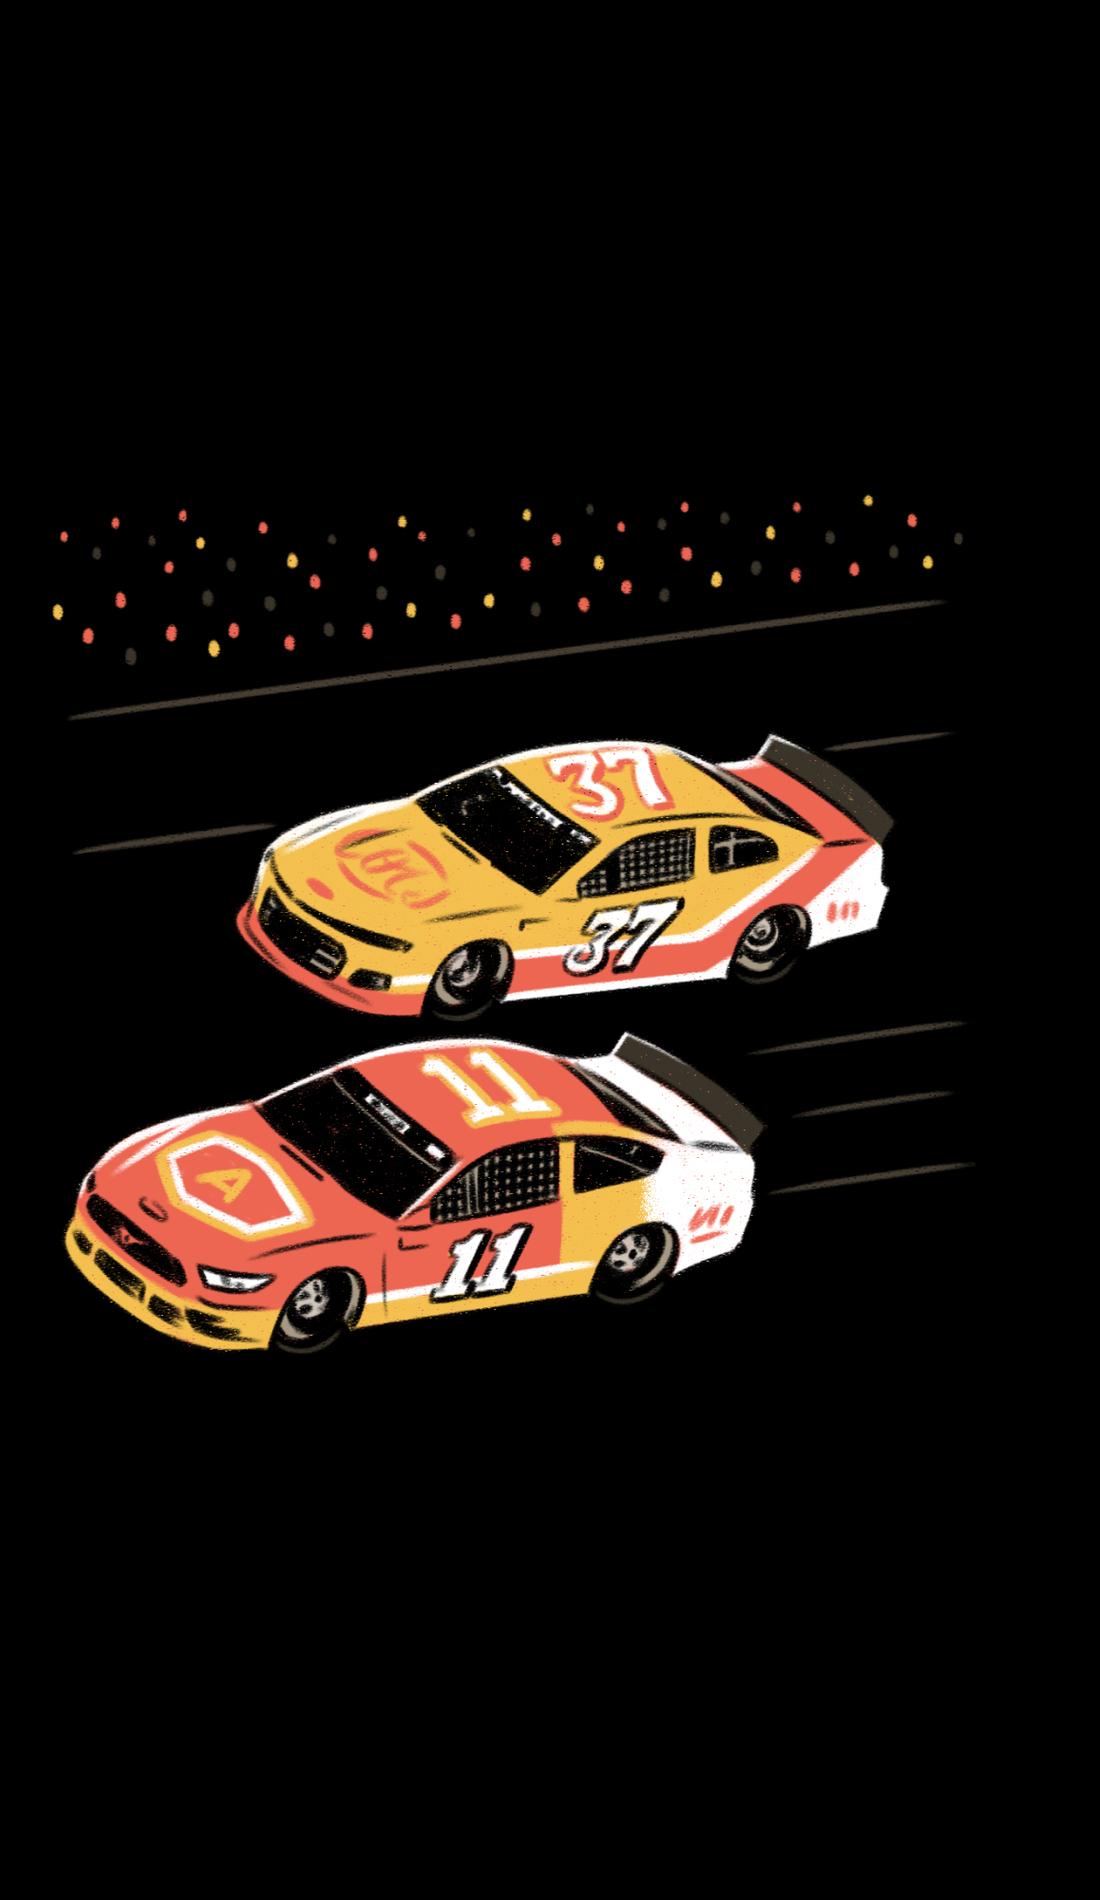 A NASCAR XFinity Series: Daytona 300 live event